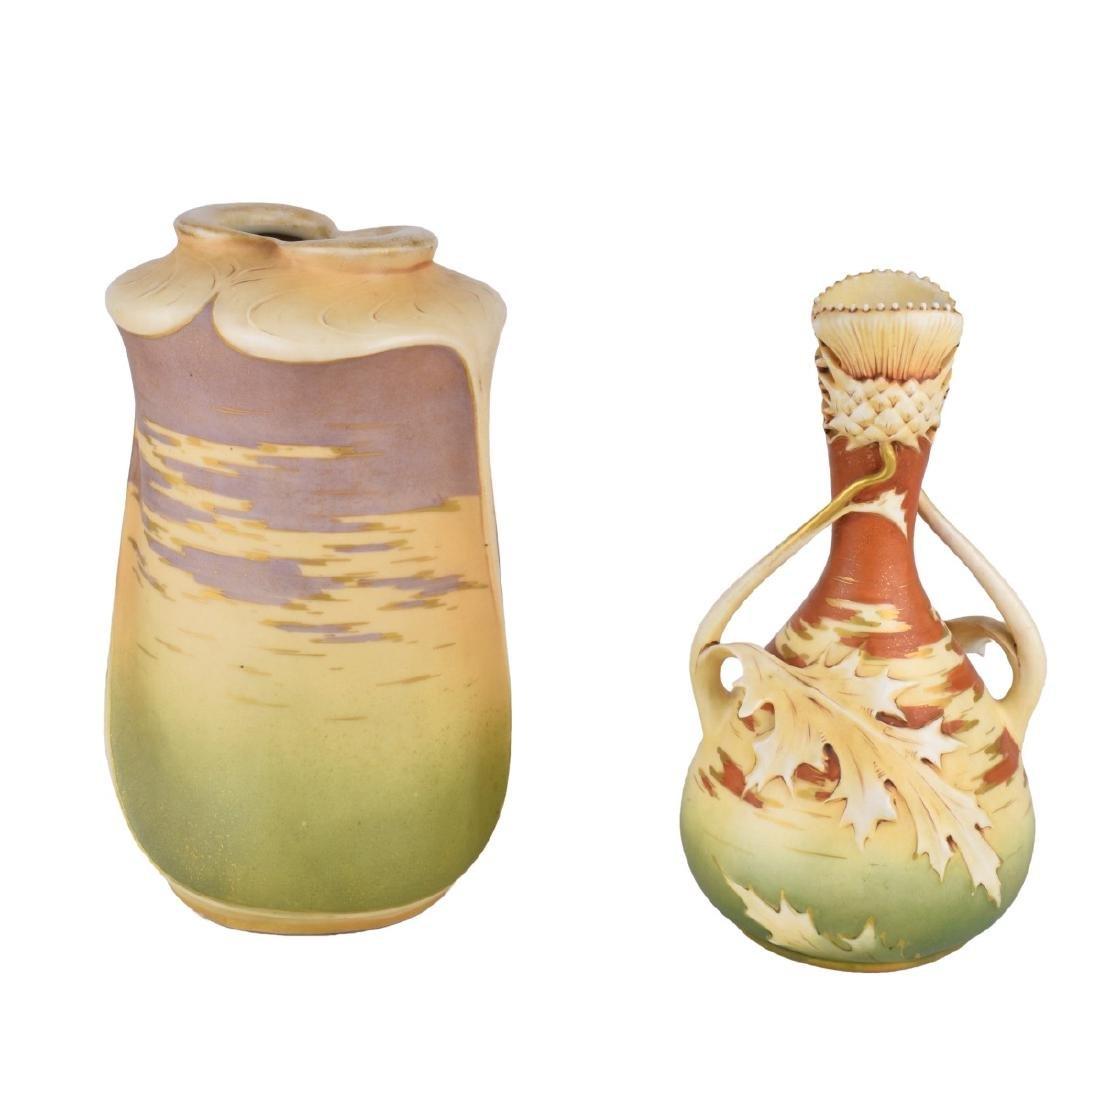 Two Turn Teplitz Amphora Pottery Vases